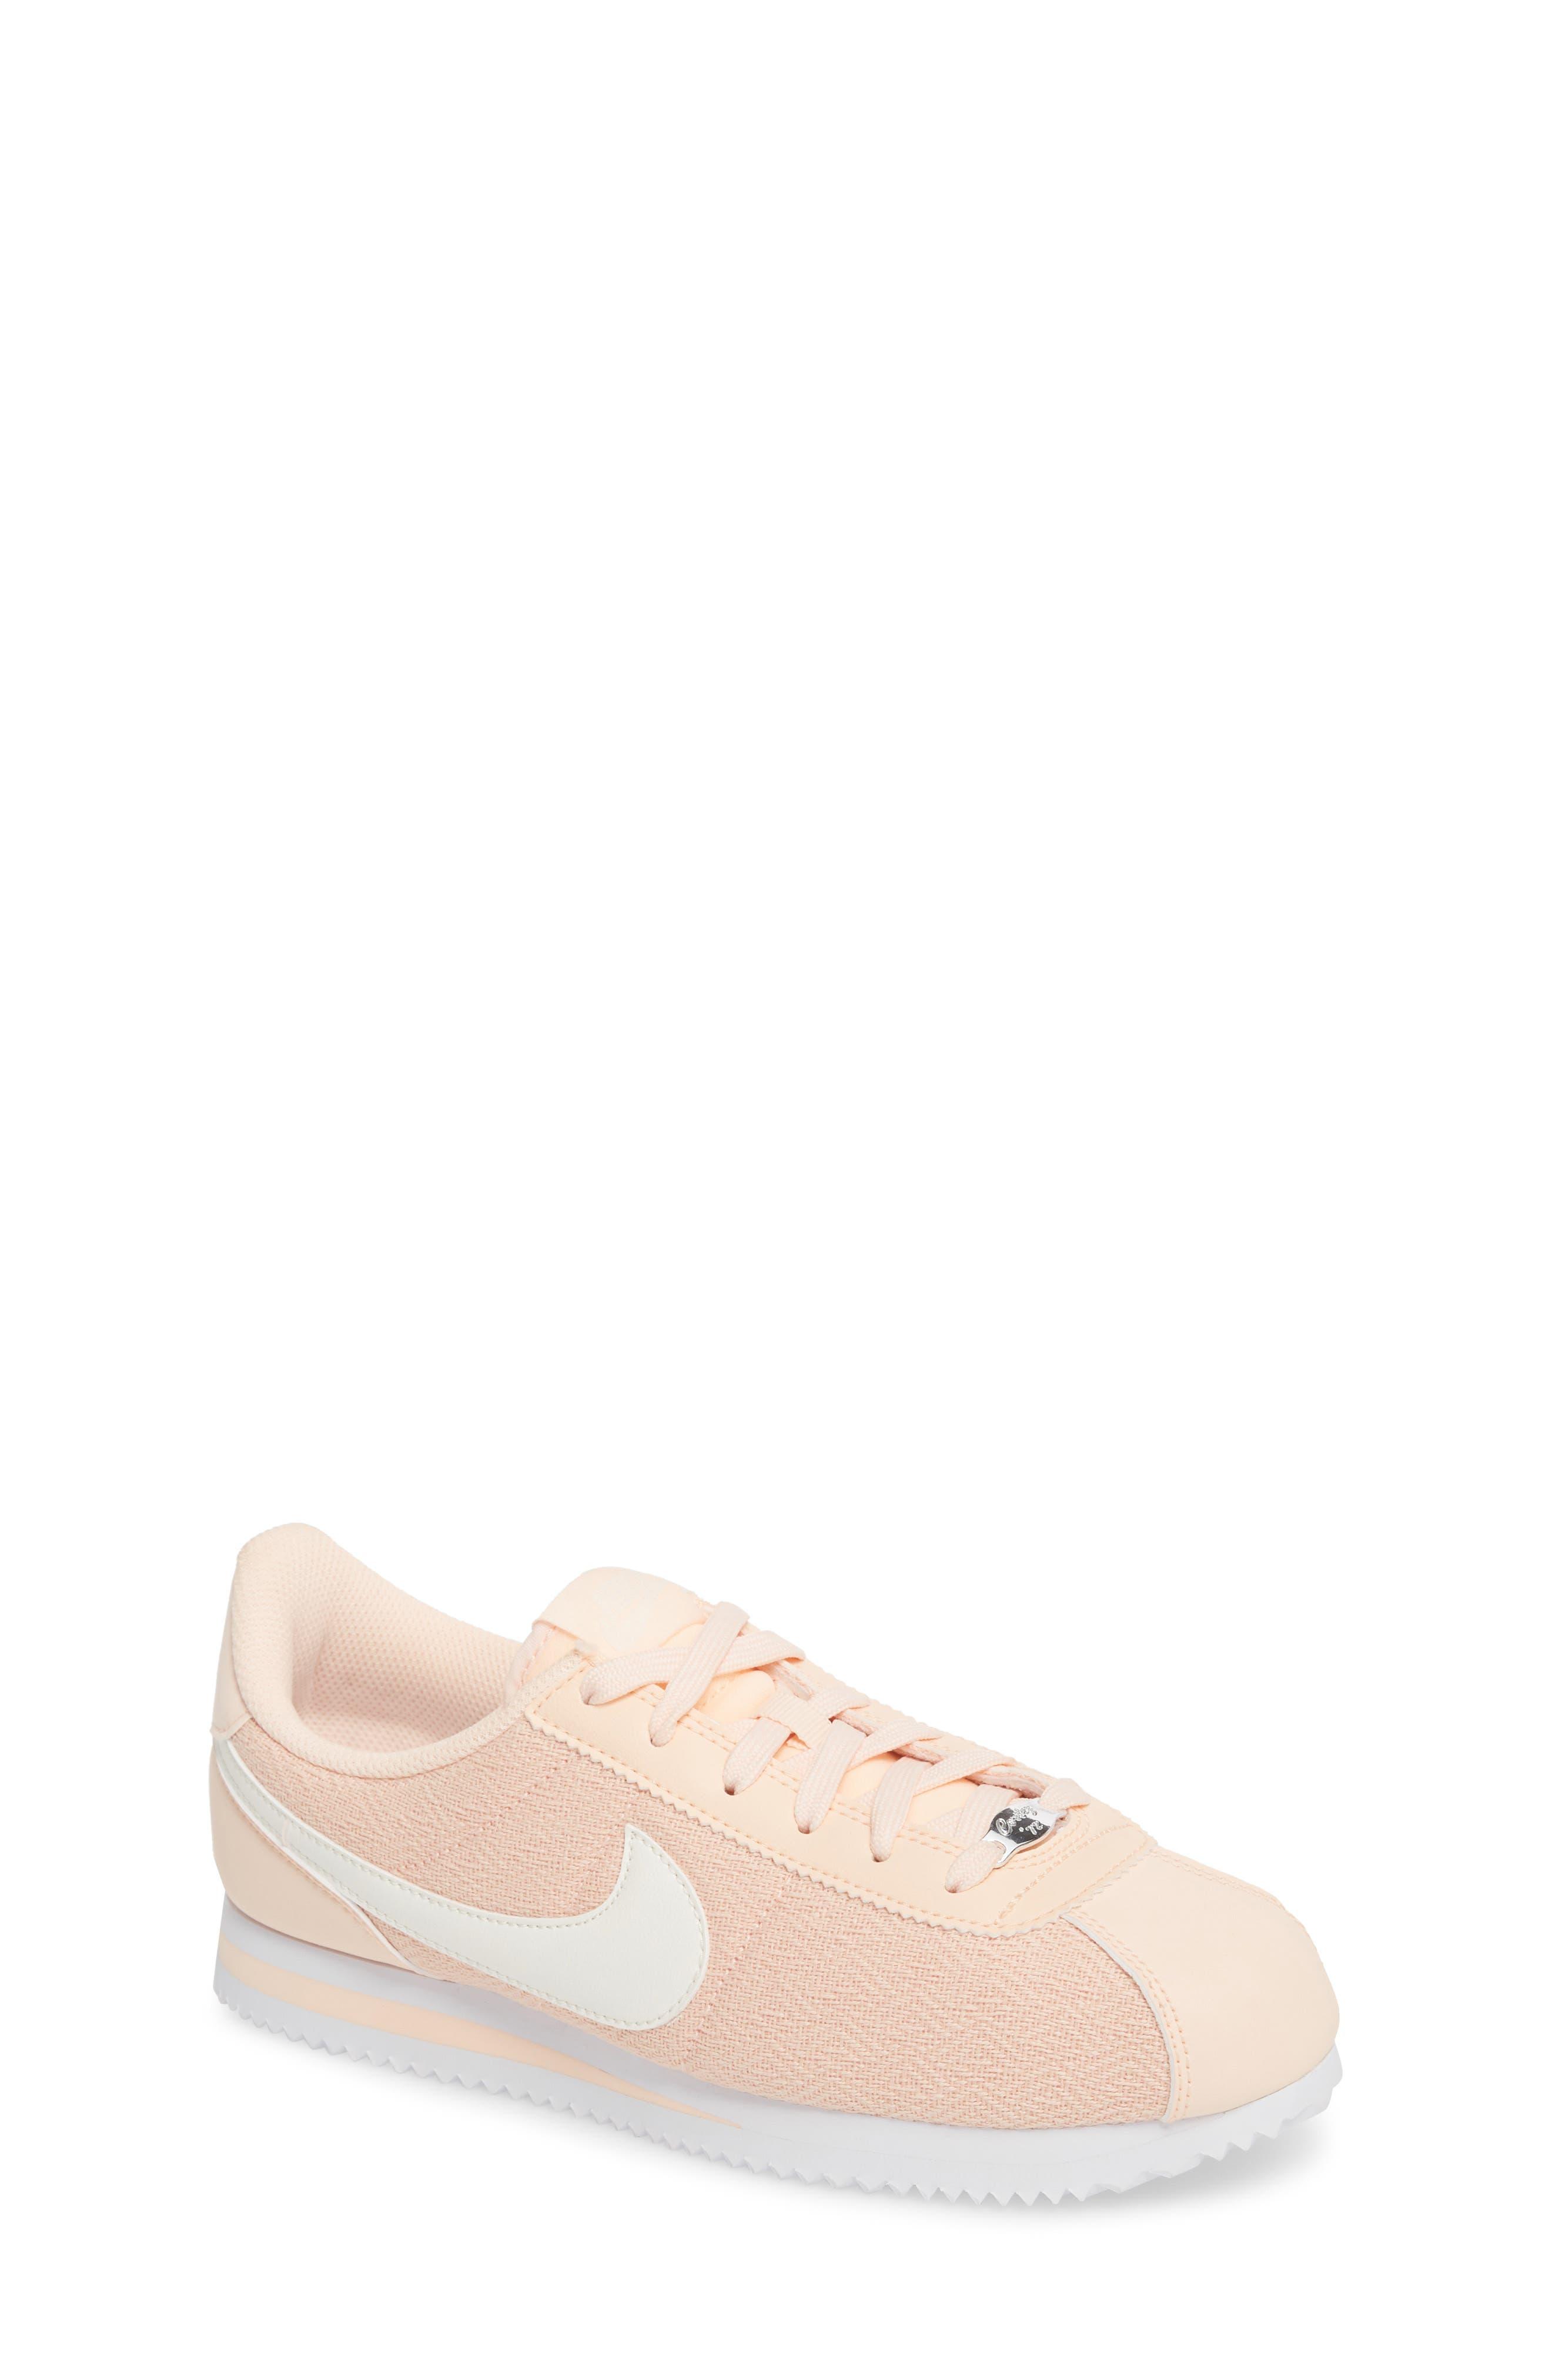 Cortez Basic TXT SE Sneaker,                             Main thumbnail 1, color,                             Crimson Tint/ Sail/ White